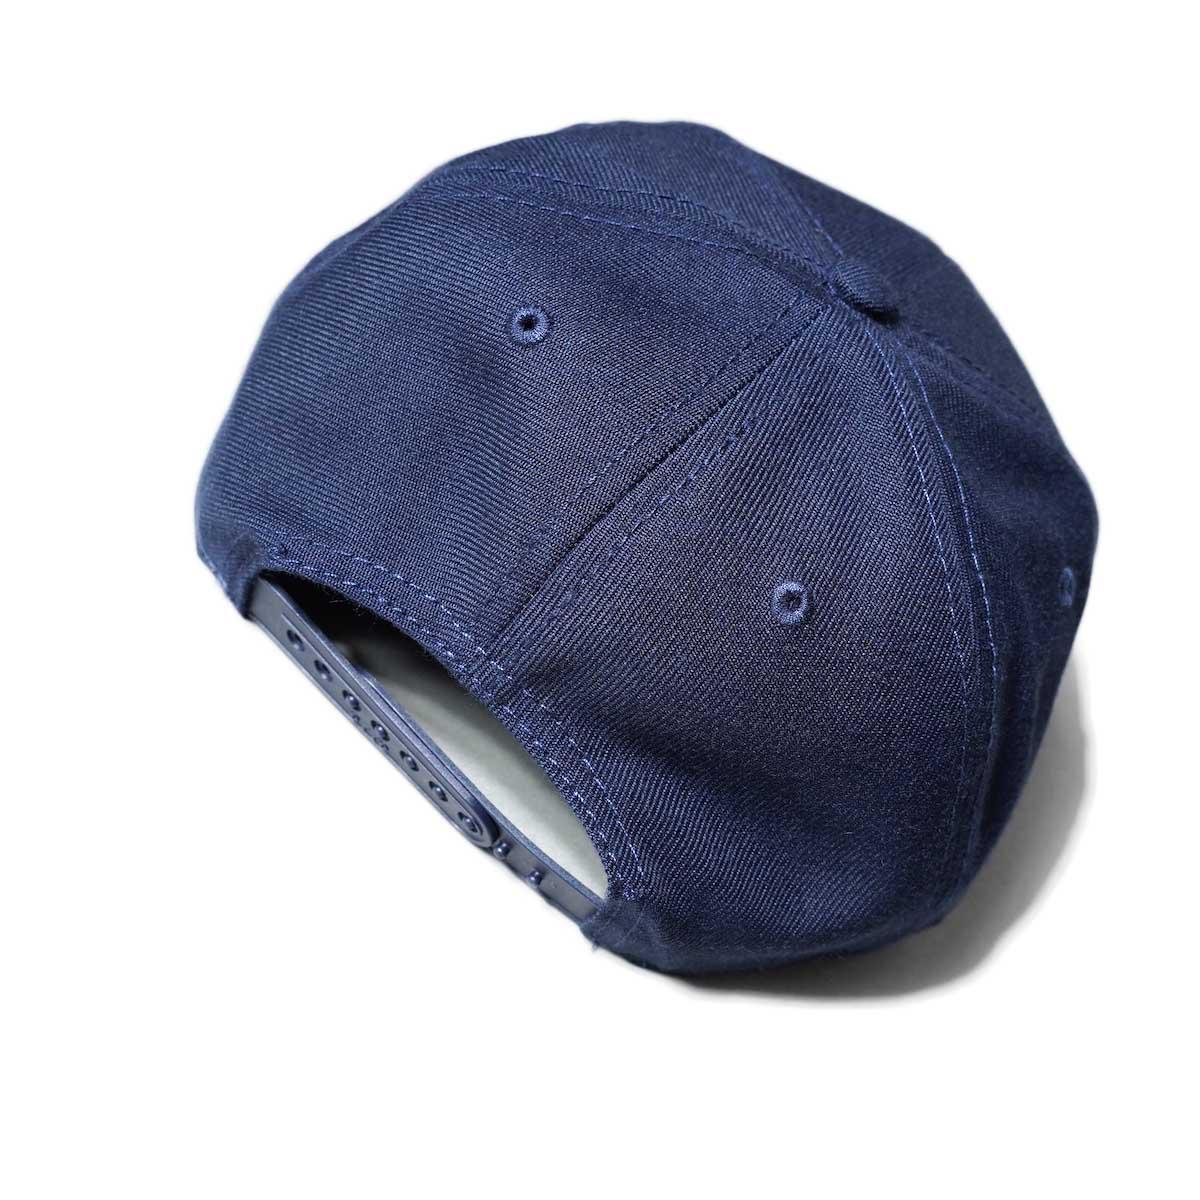 South2 West8 / BASEBALL CAP スナップバック